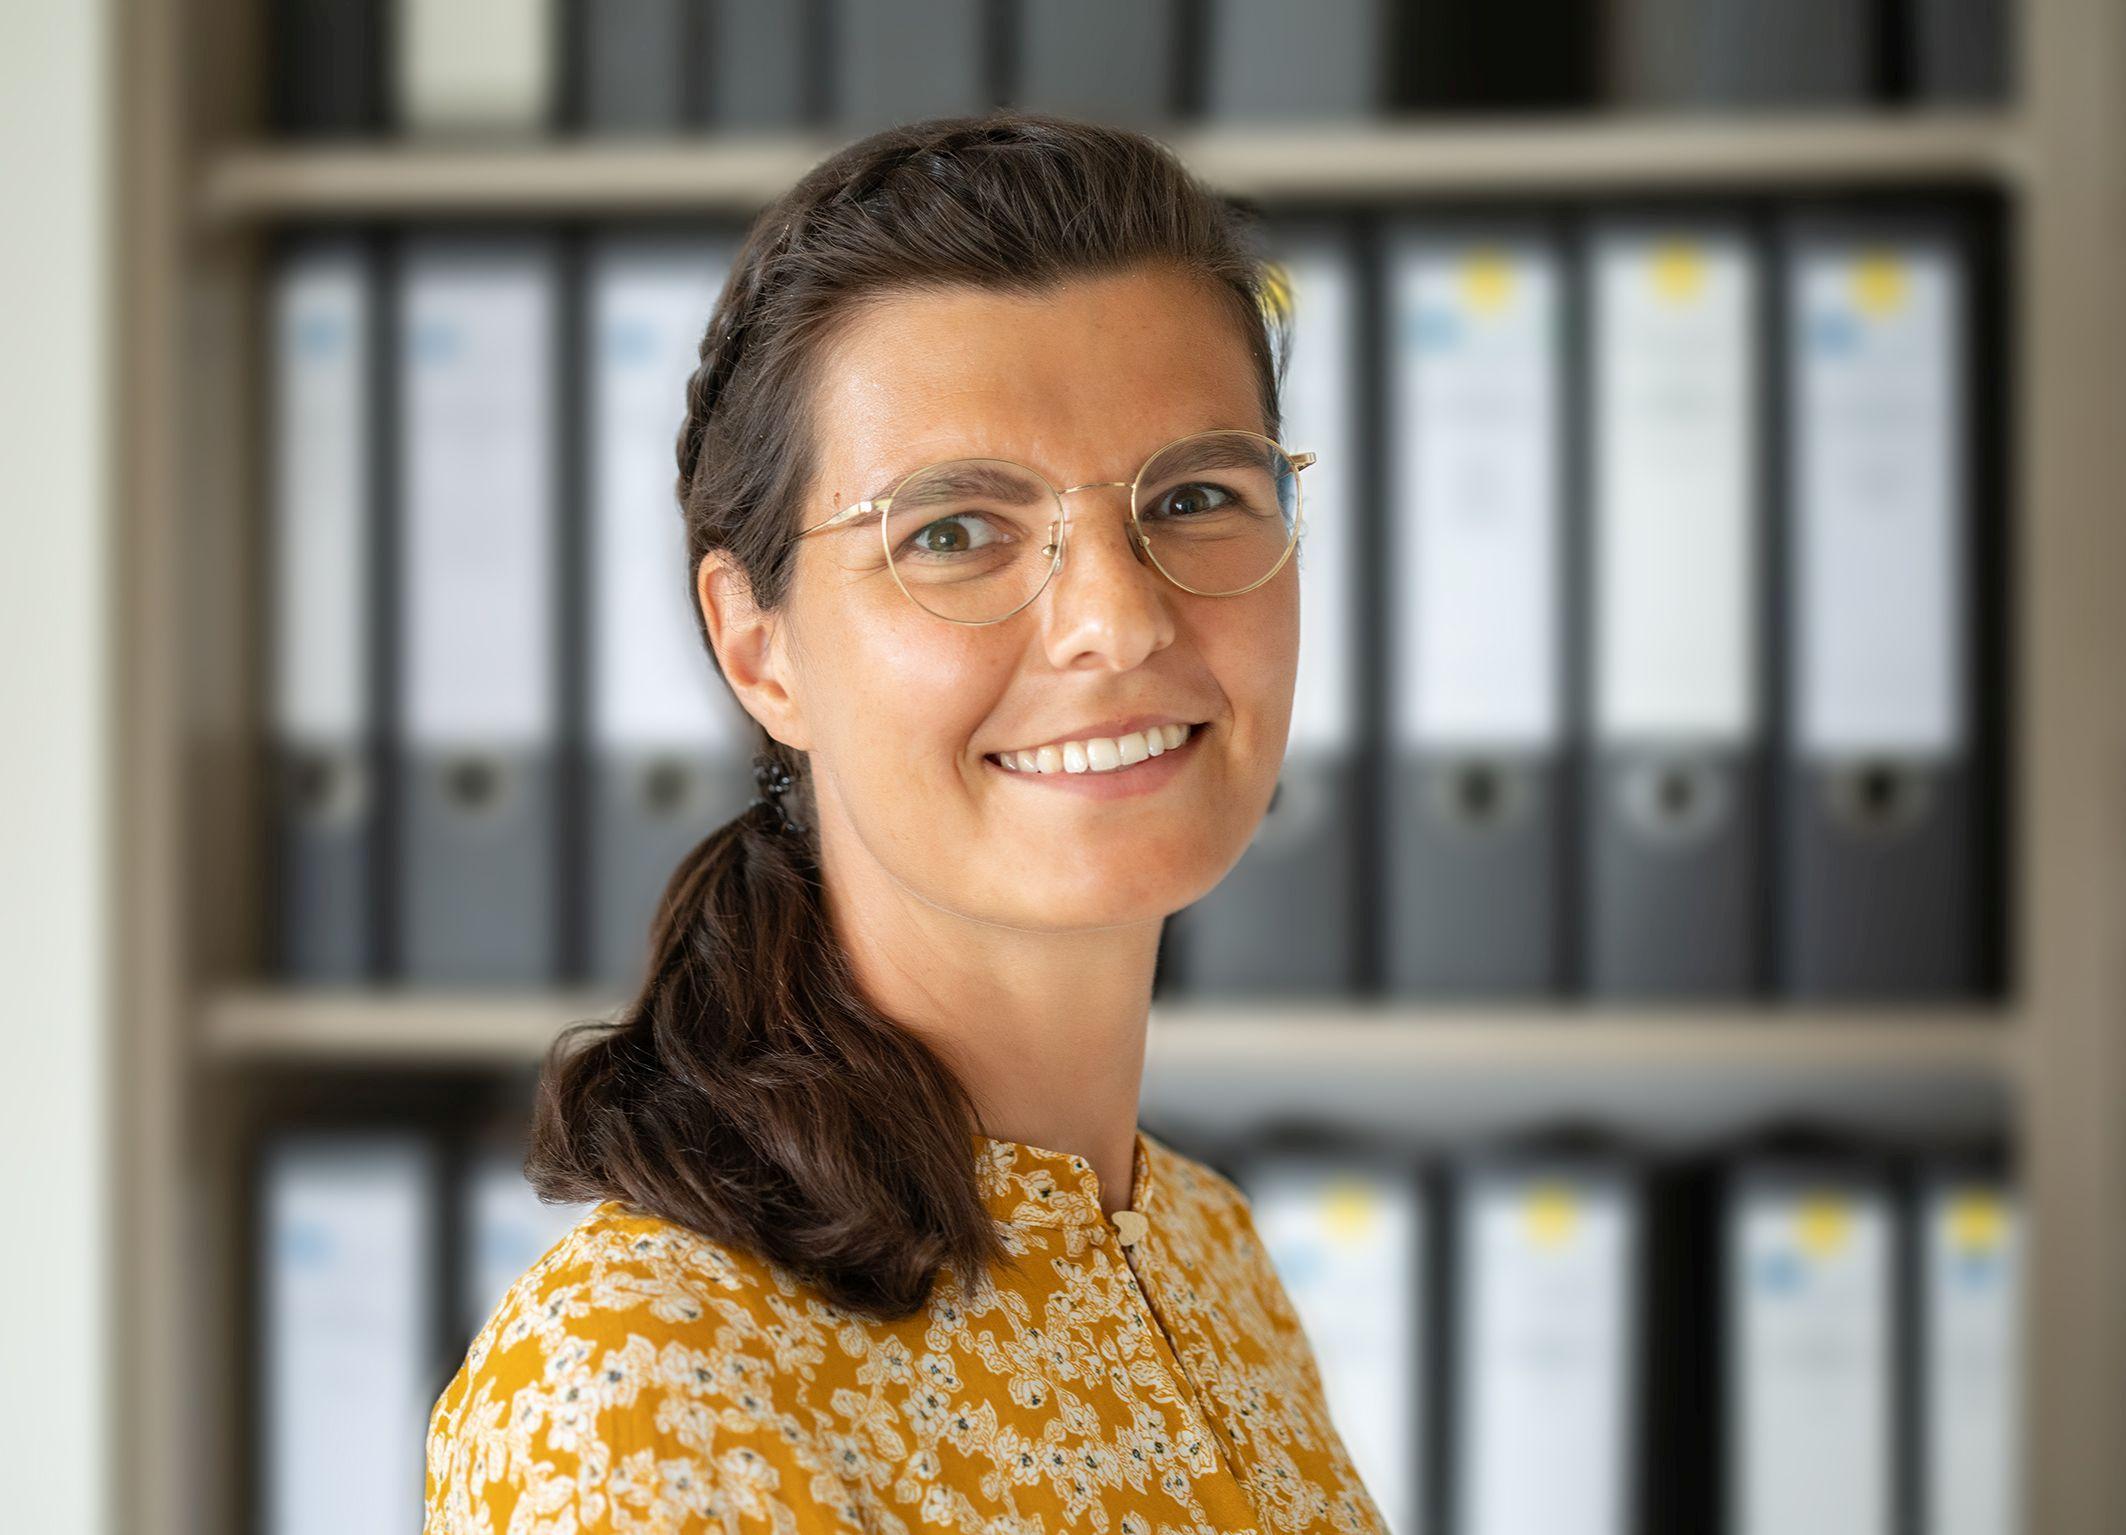 Lisa Mährlein